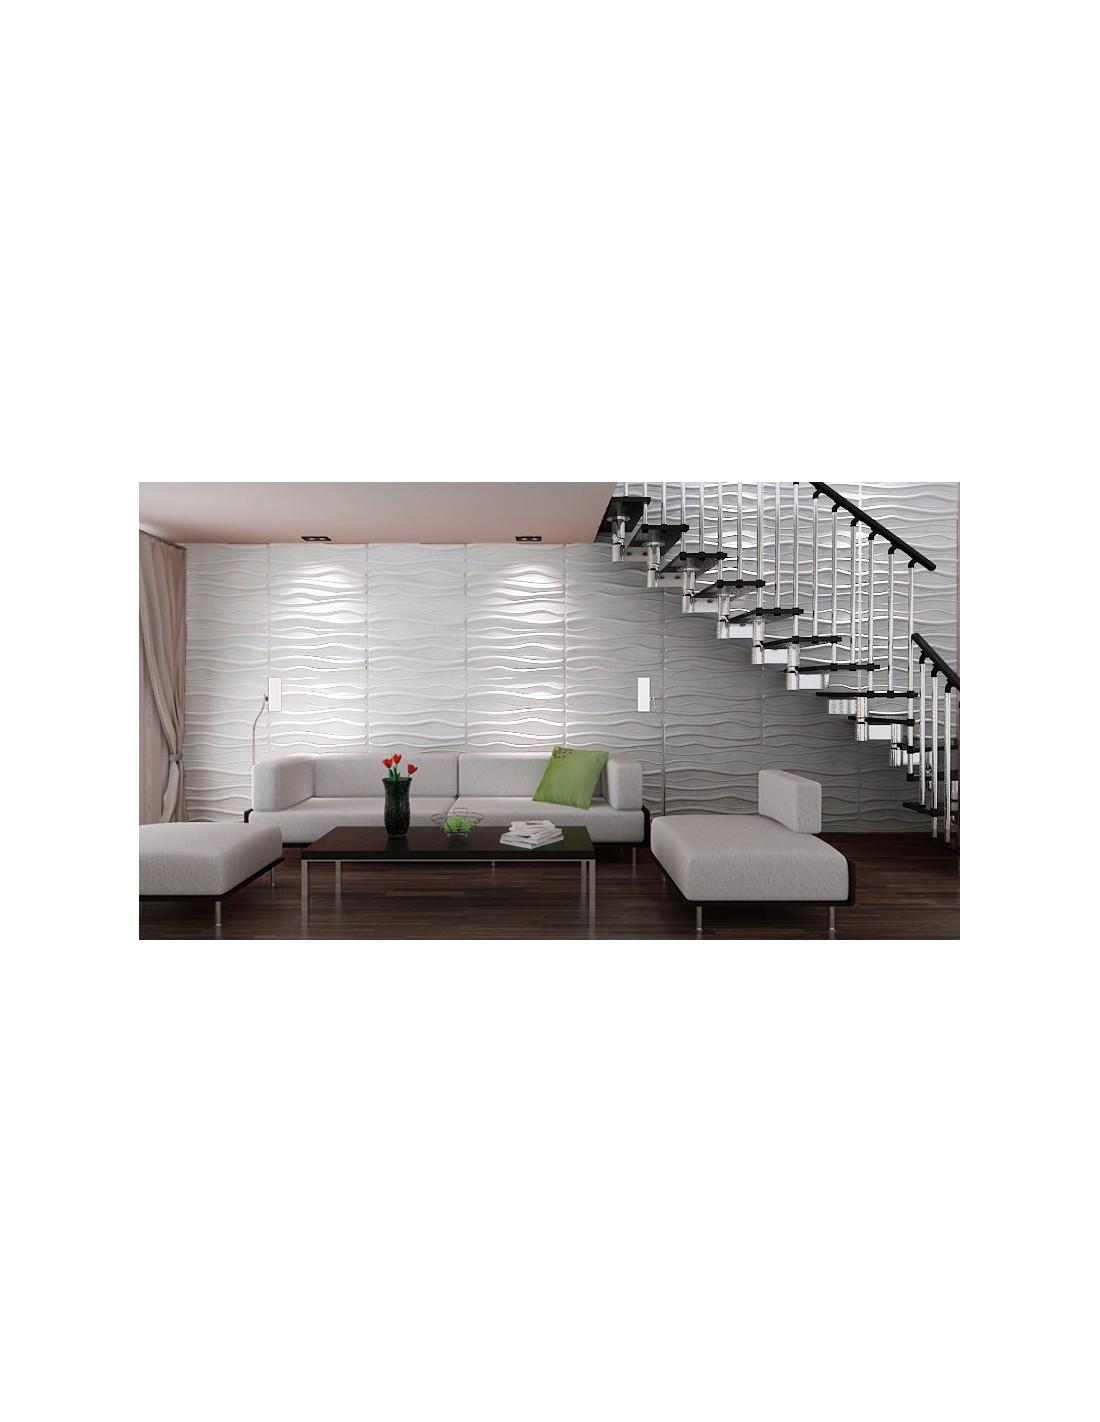 Pannelli 3d per pareti  Pannelli decorativi plexiglass